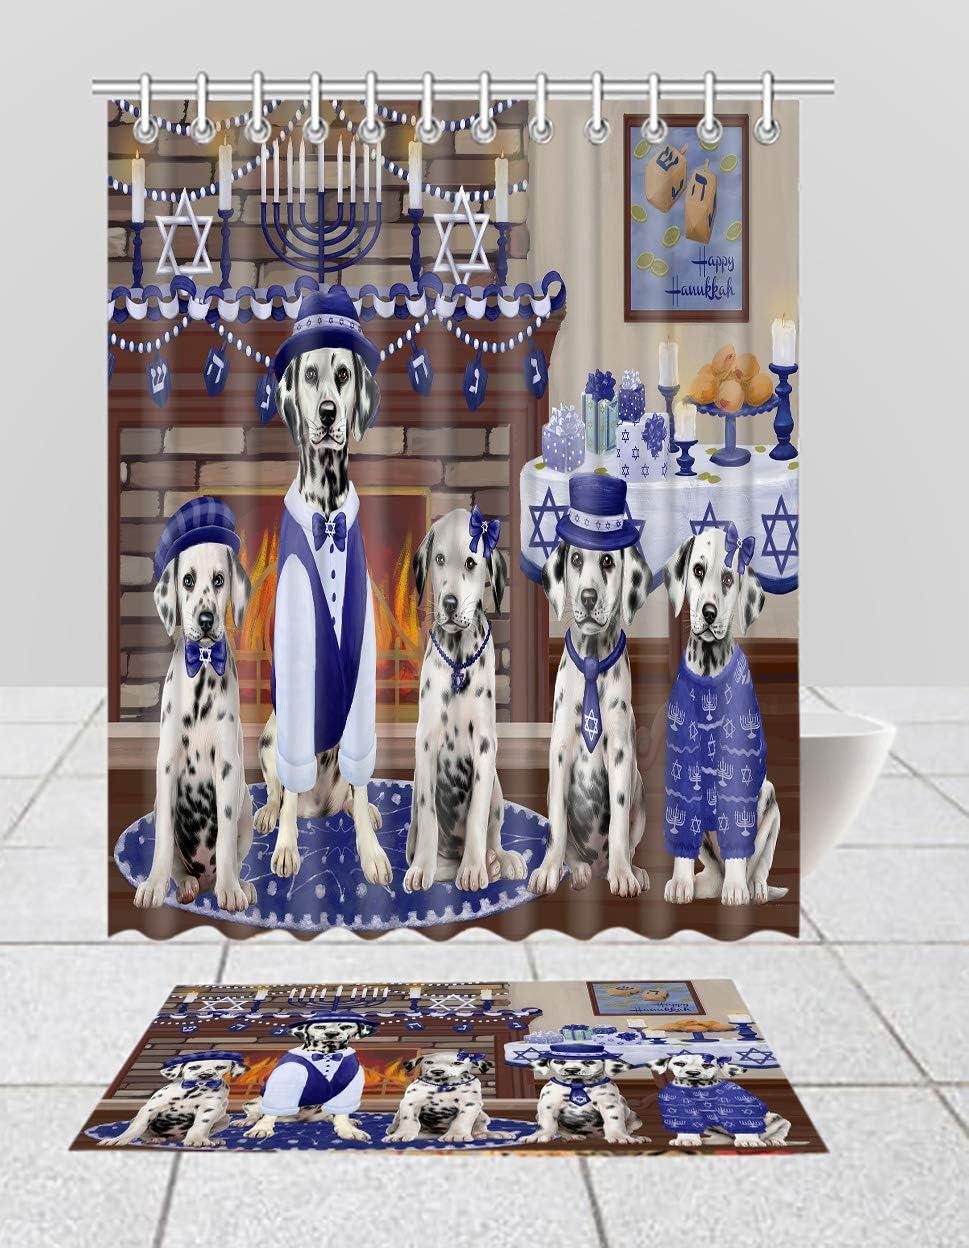 Max 49% OFF Happy Hanukkah Family Dalmatian Dogs Mat Shower Overseas parallel import regular item C Curtain Bath